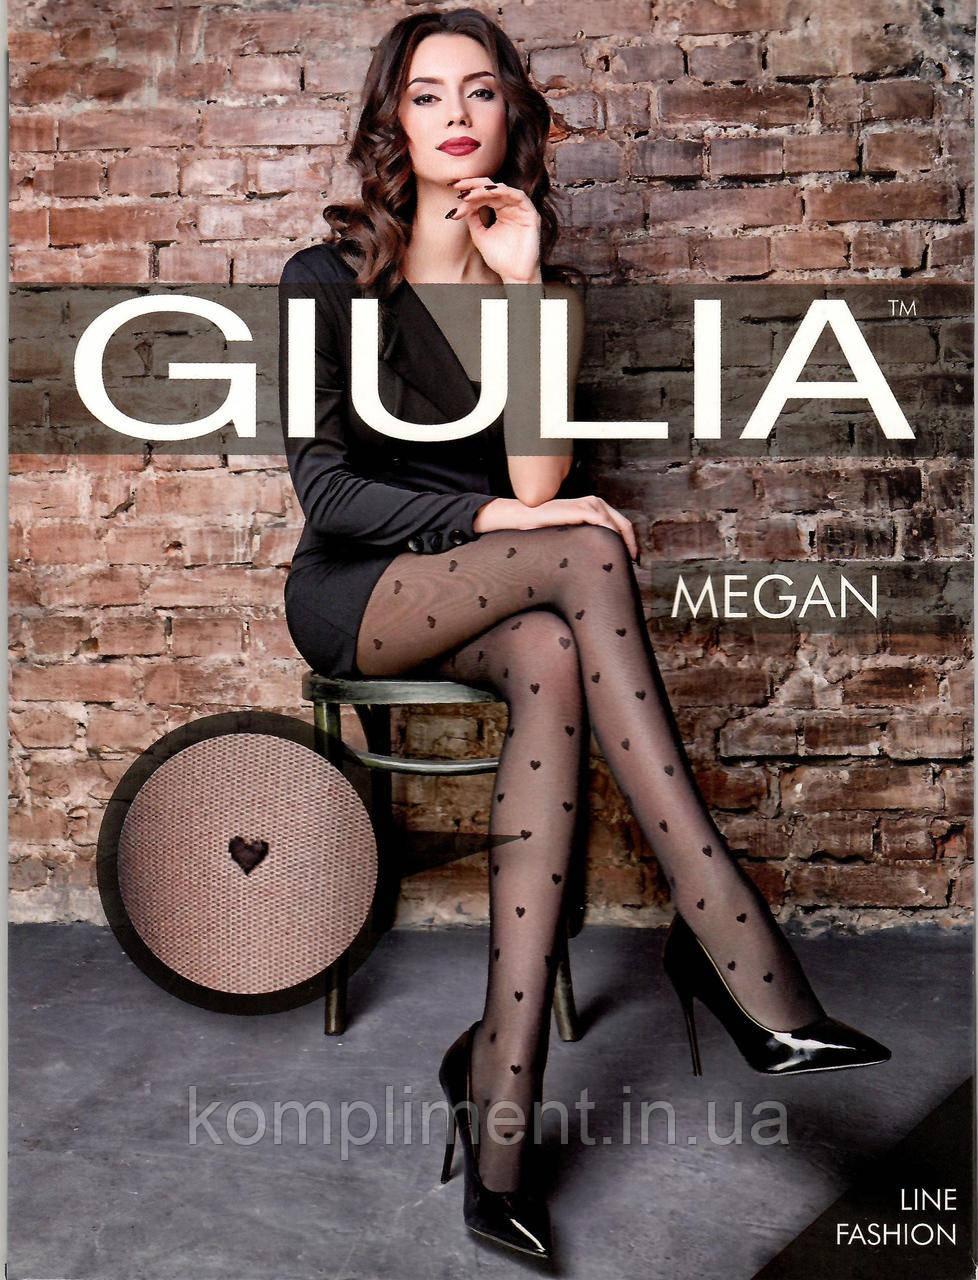 Колготки женские с рисунком сердечки GIULIA  MEGAN 40 model 1